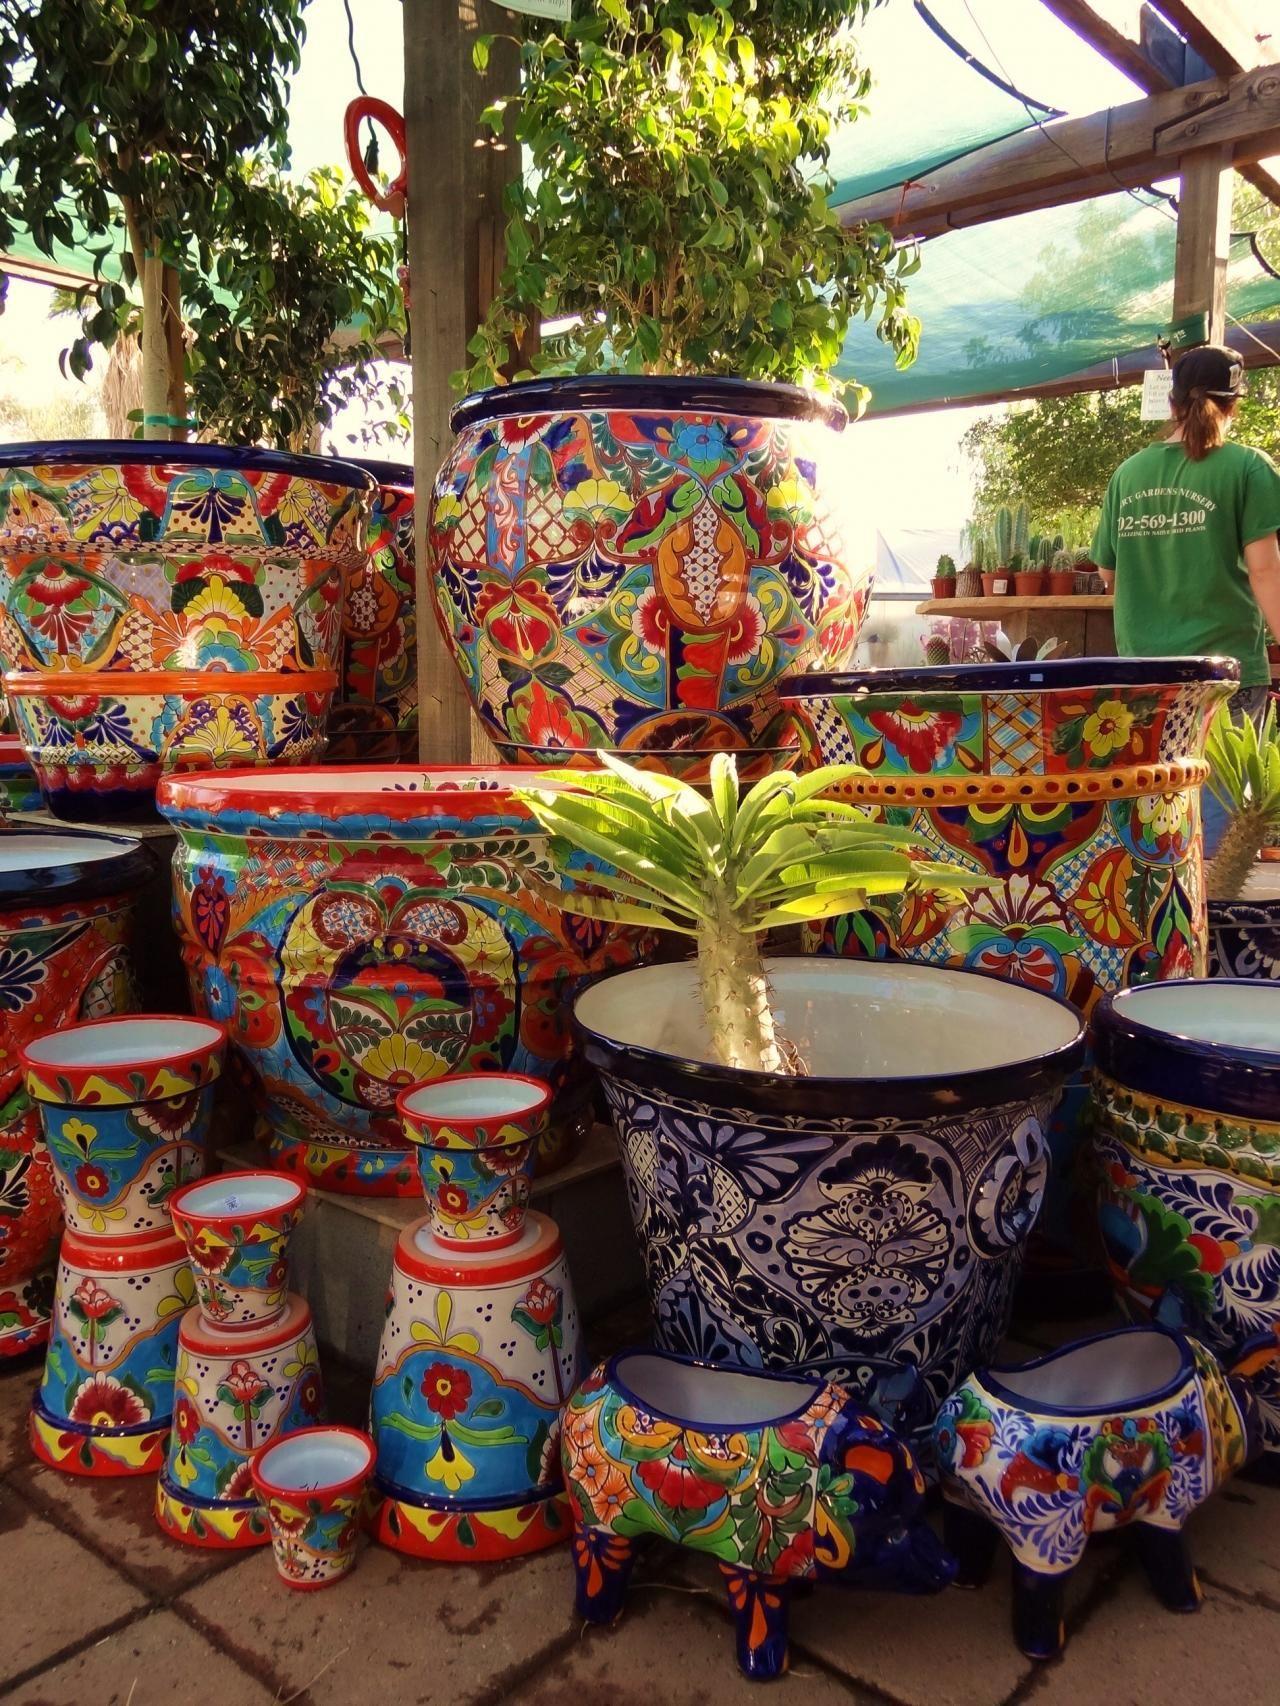 High Quality Explore Mexican Patio, Mexican Garden, And More!